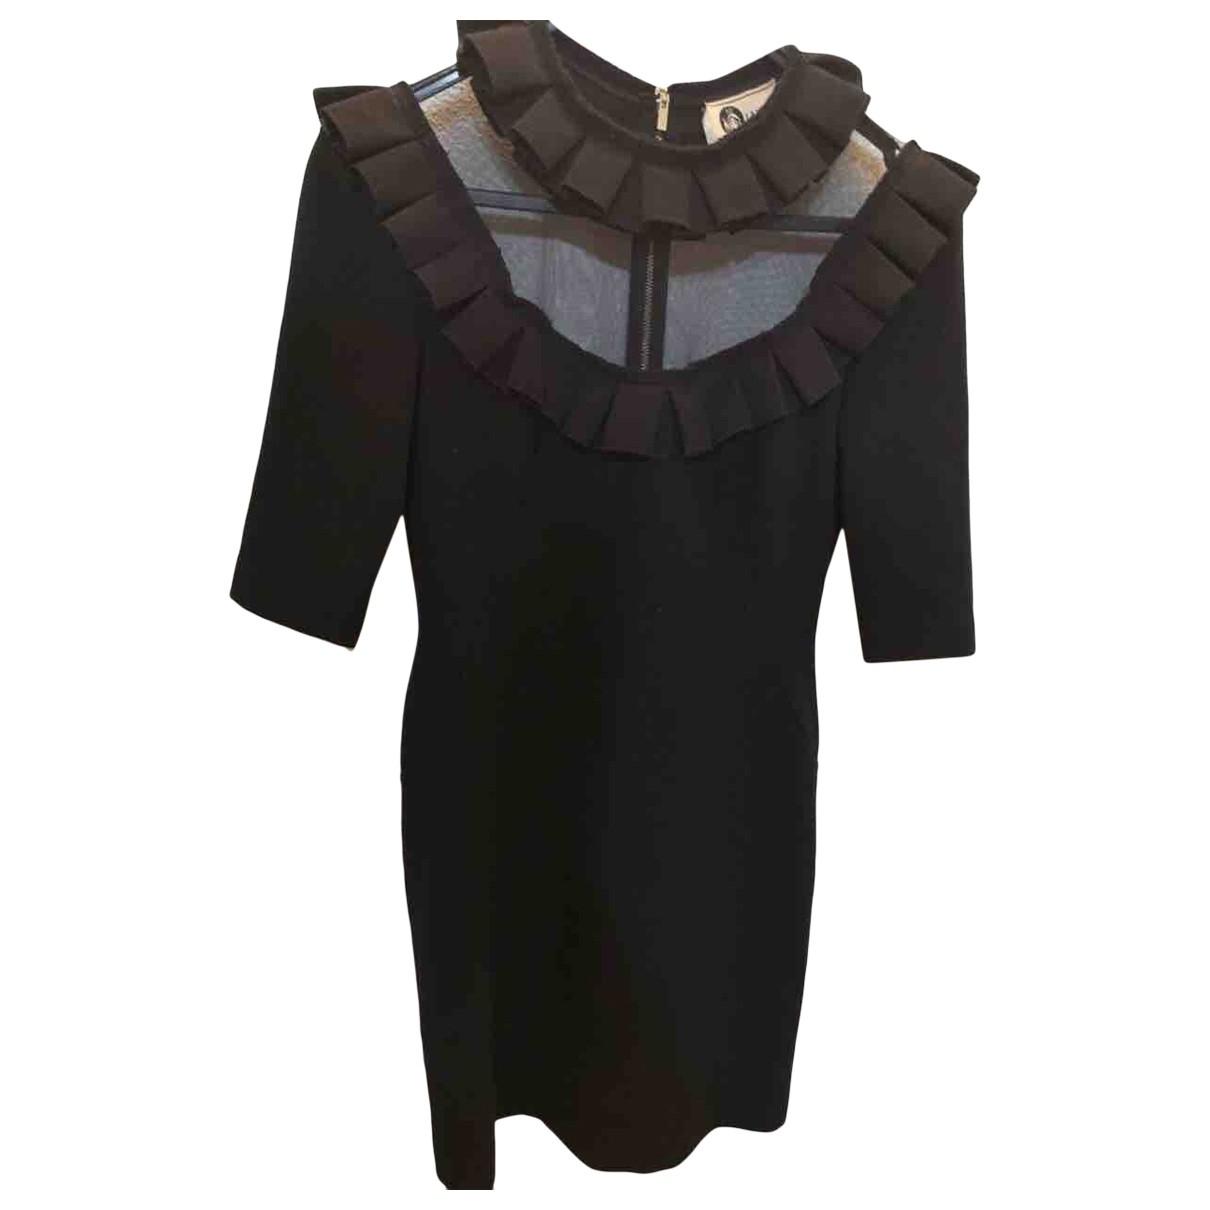 Lanvin \N Black Cotton dress for Women 36 FR